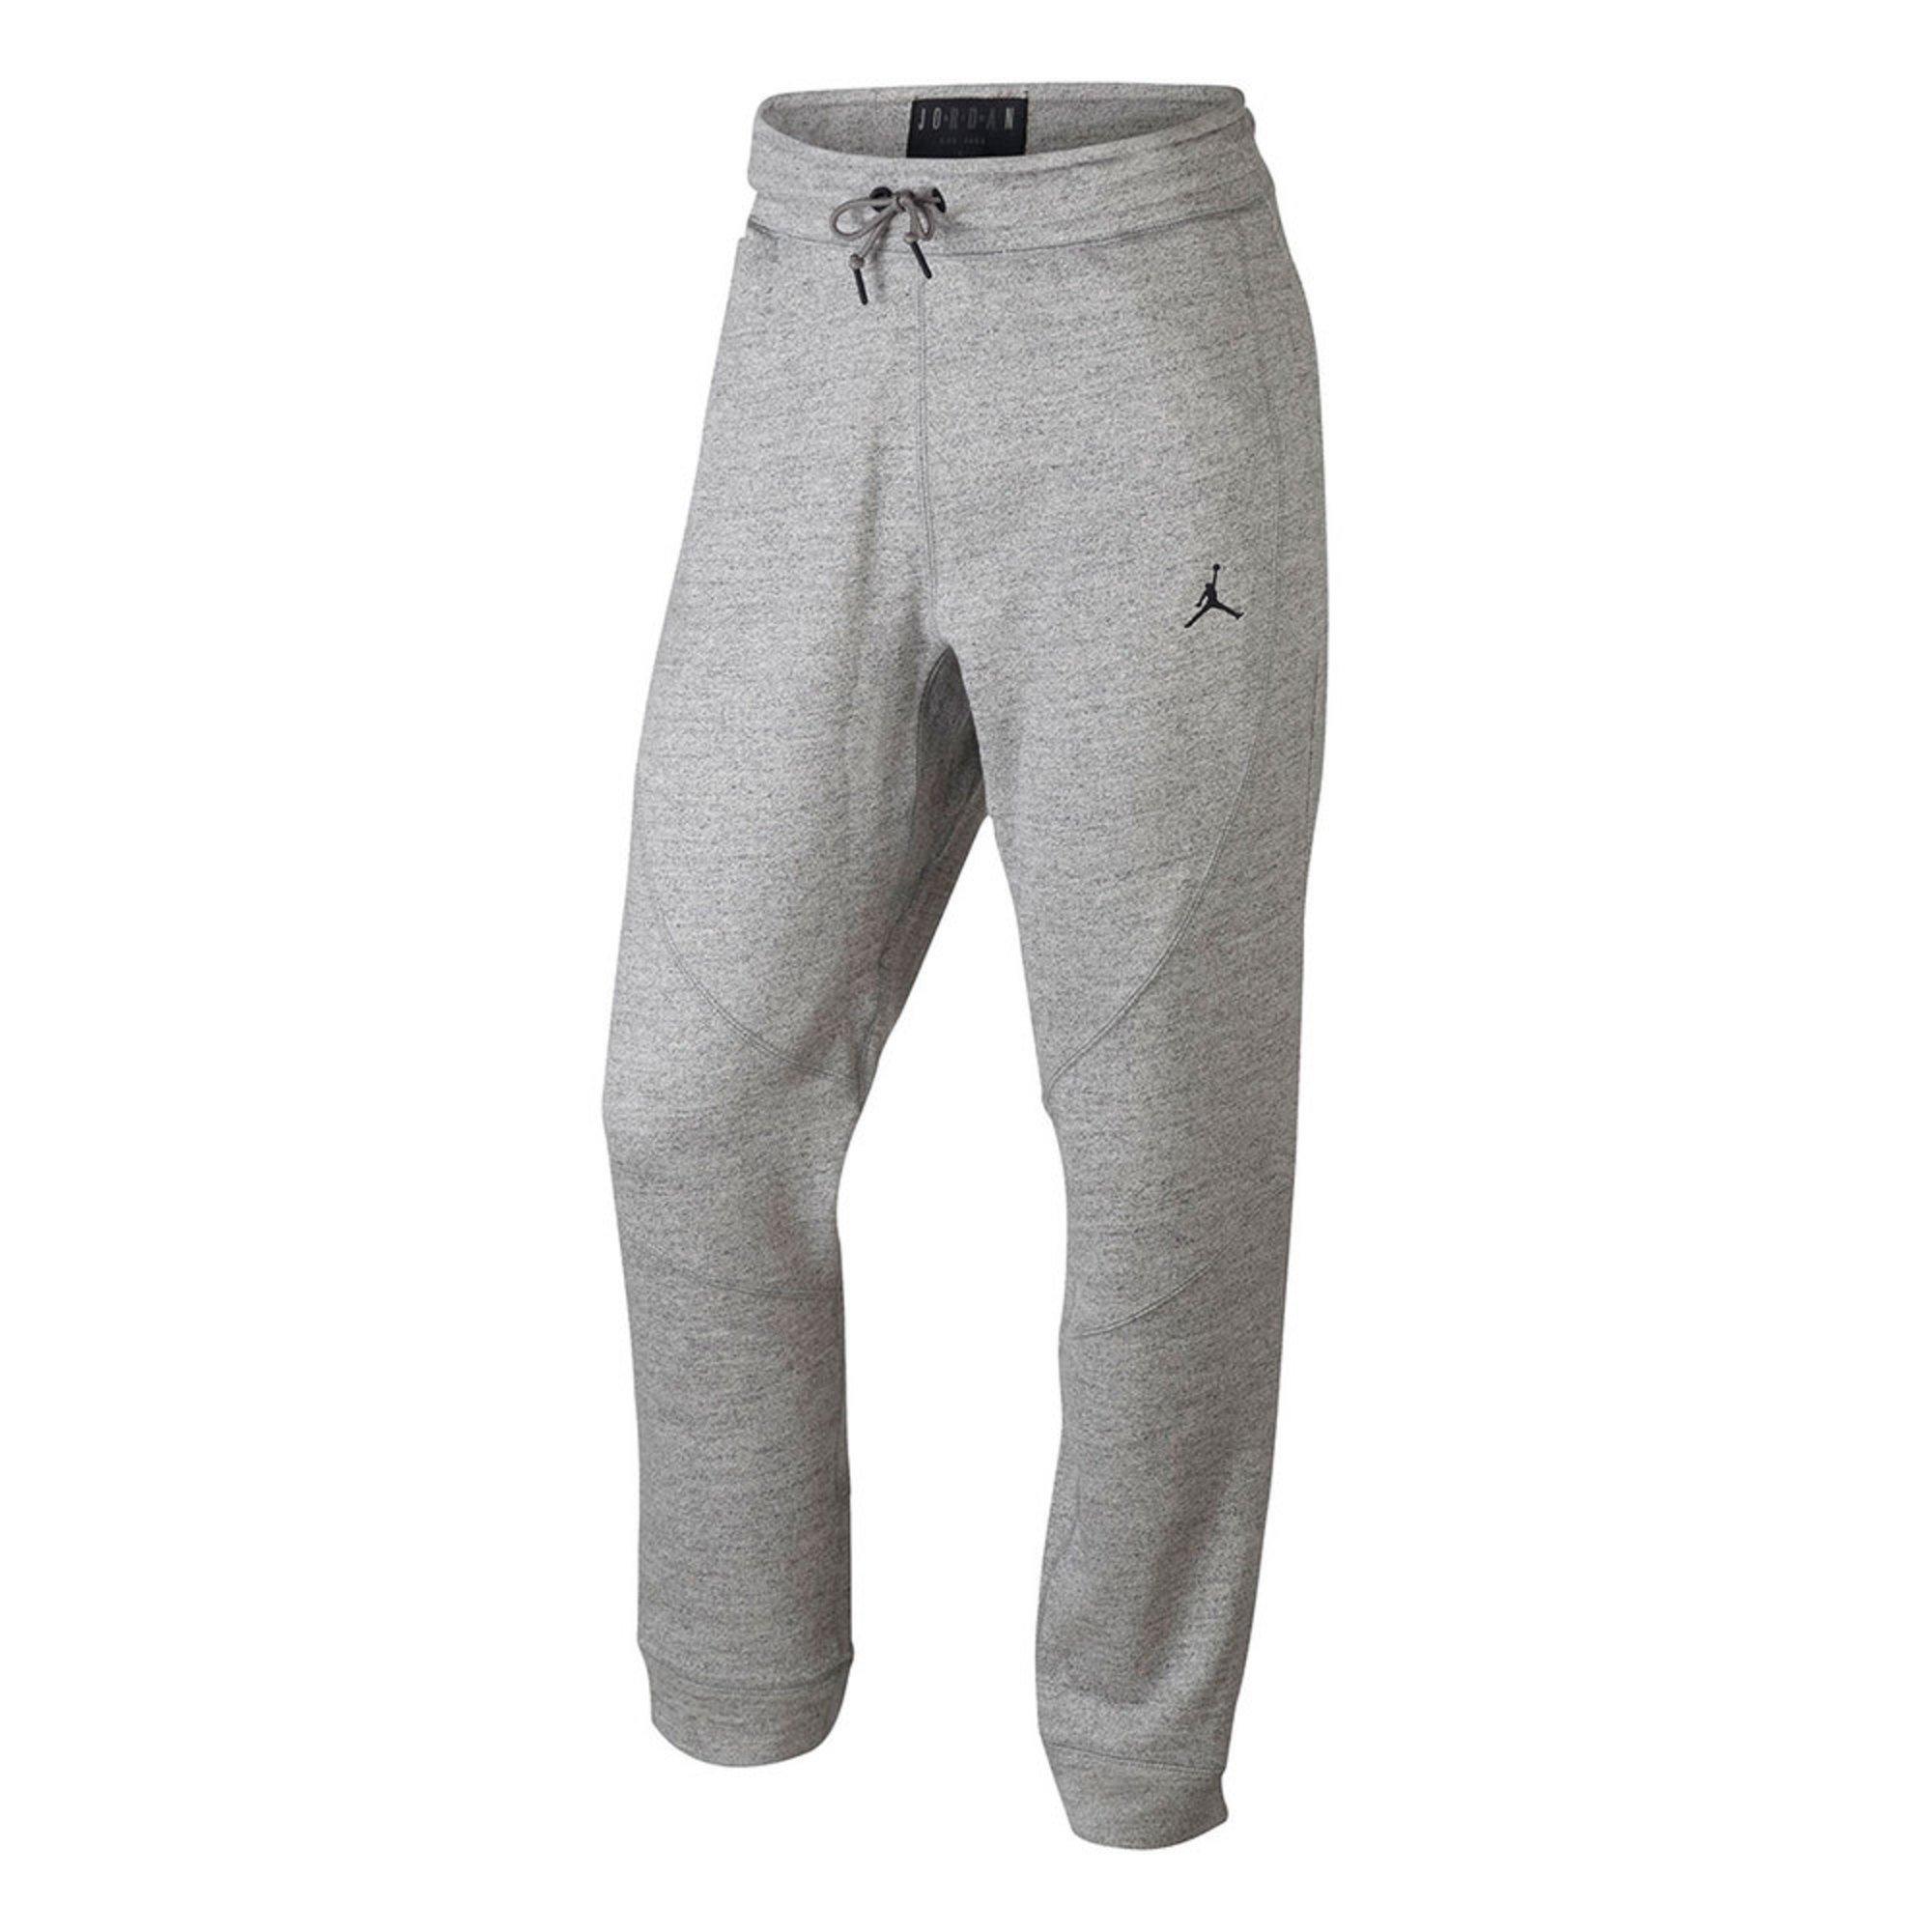 finest selection fa072 aceeb Activewear Pants. 063